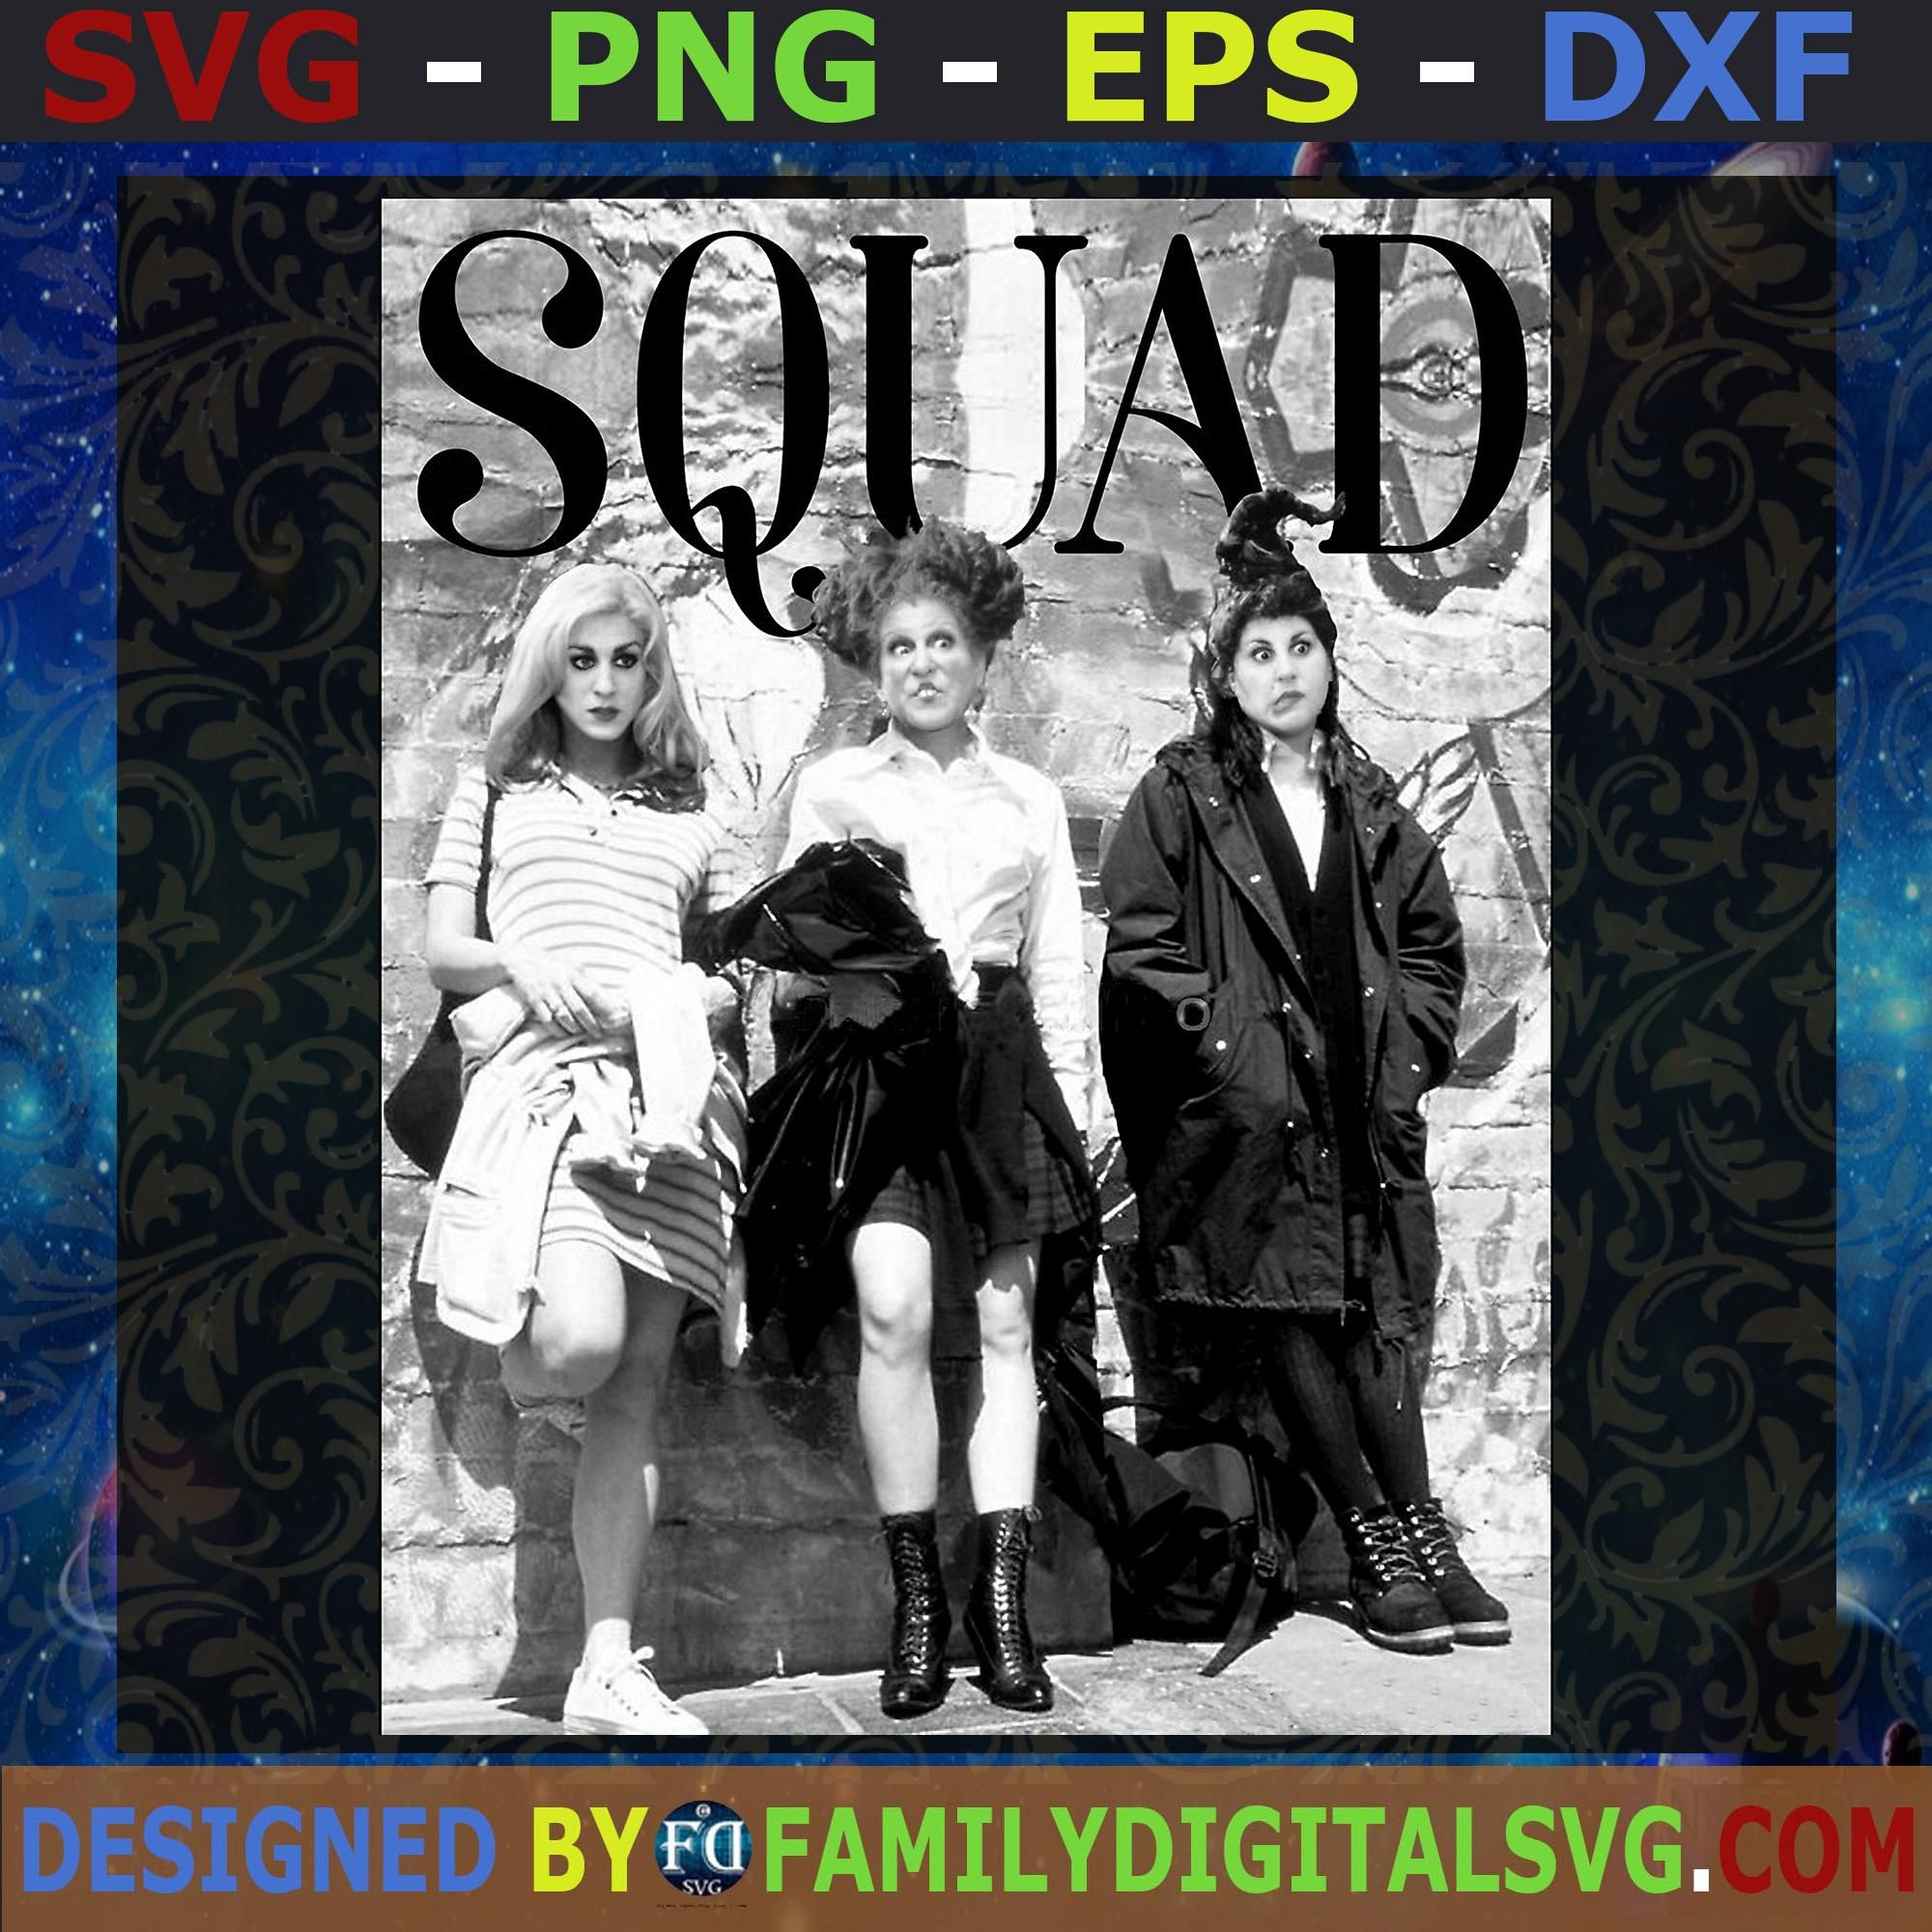 Squad Png Hocus Pocus Png Squad Hocus Pocus Png Halloween Squad Png Halloween 2020 Png Instant Download Digital Files Squad